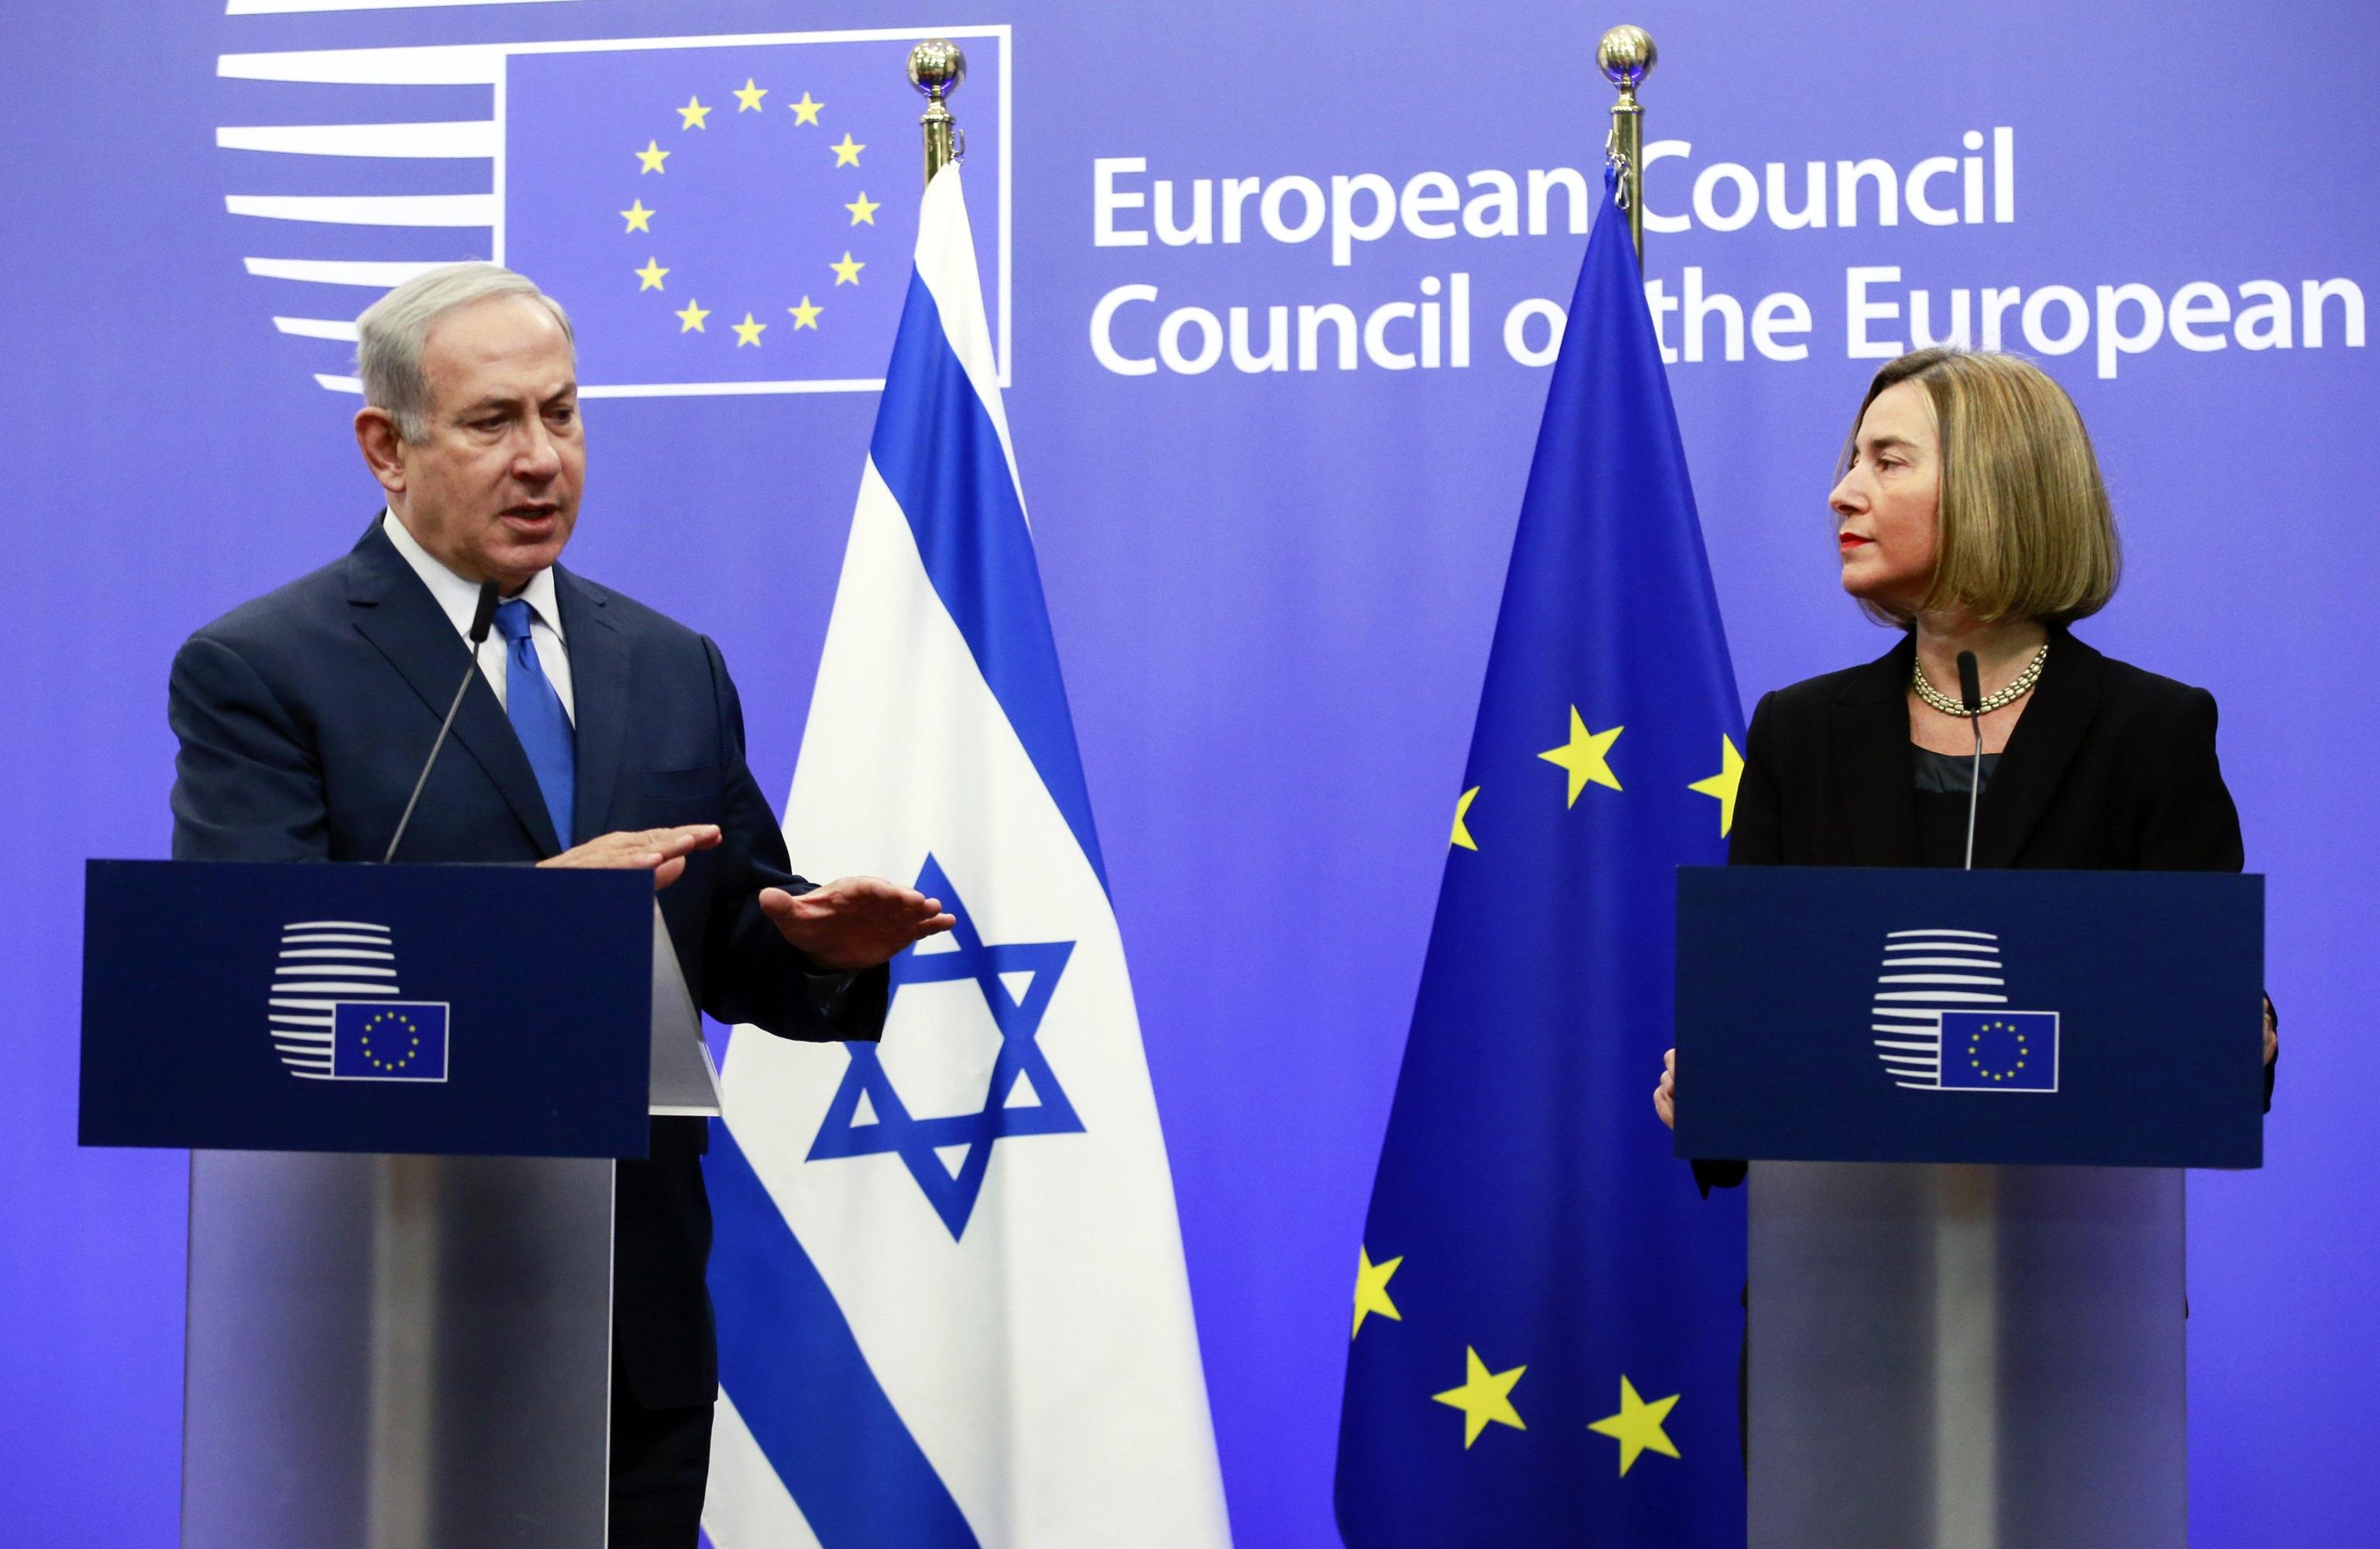 Gerusalemme:Mogherini,Ue non seguirà Usa